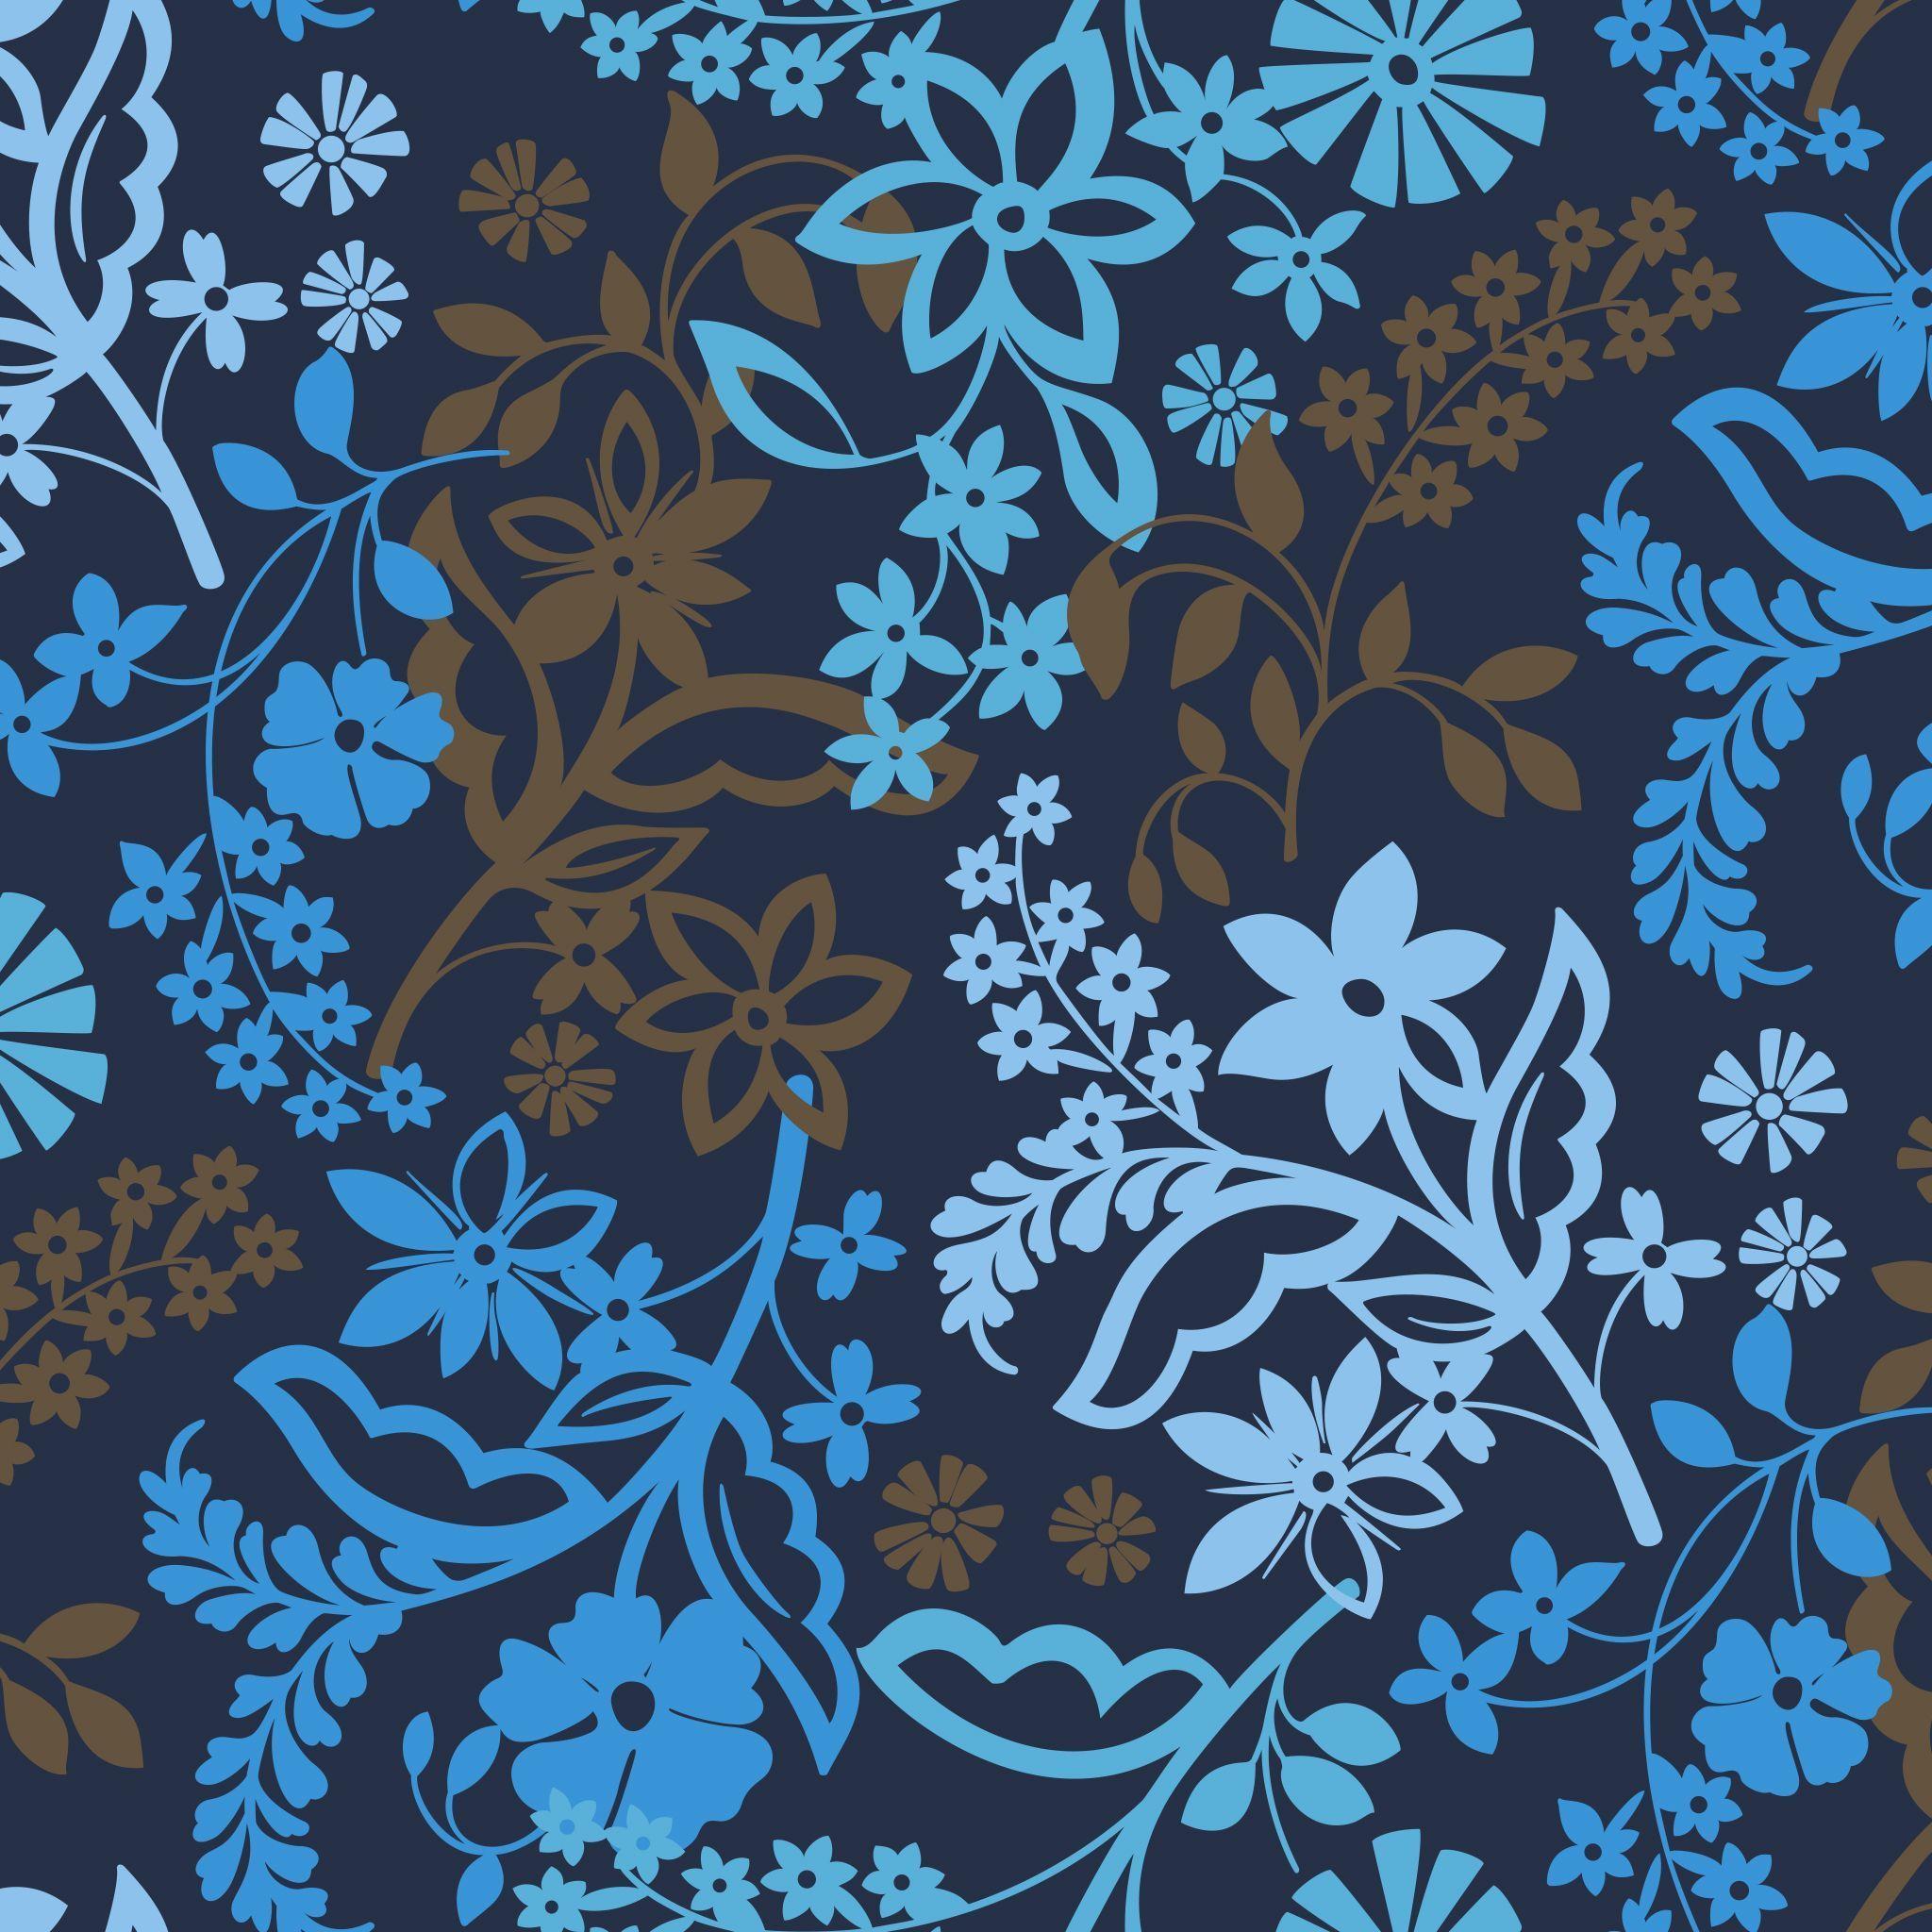 Java Floral Tablet Wallpaper Download Vera bradley